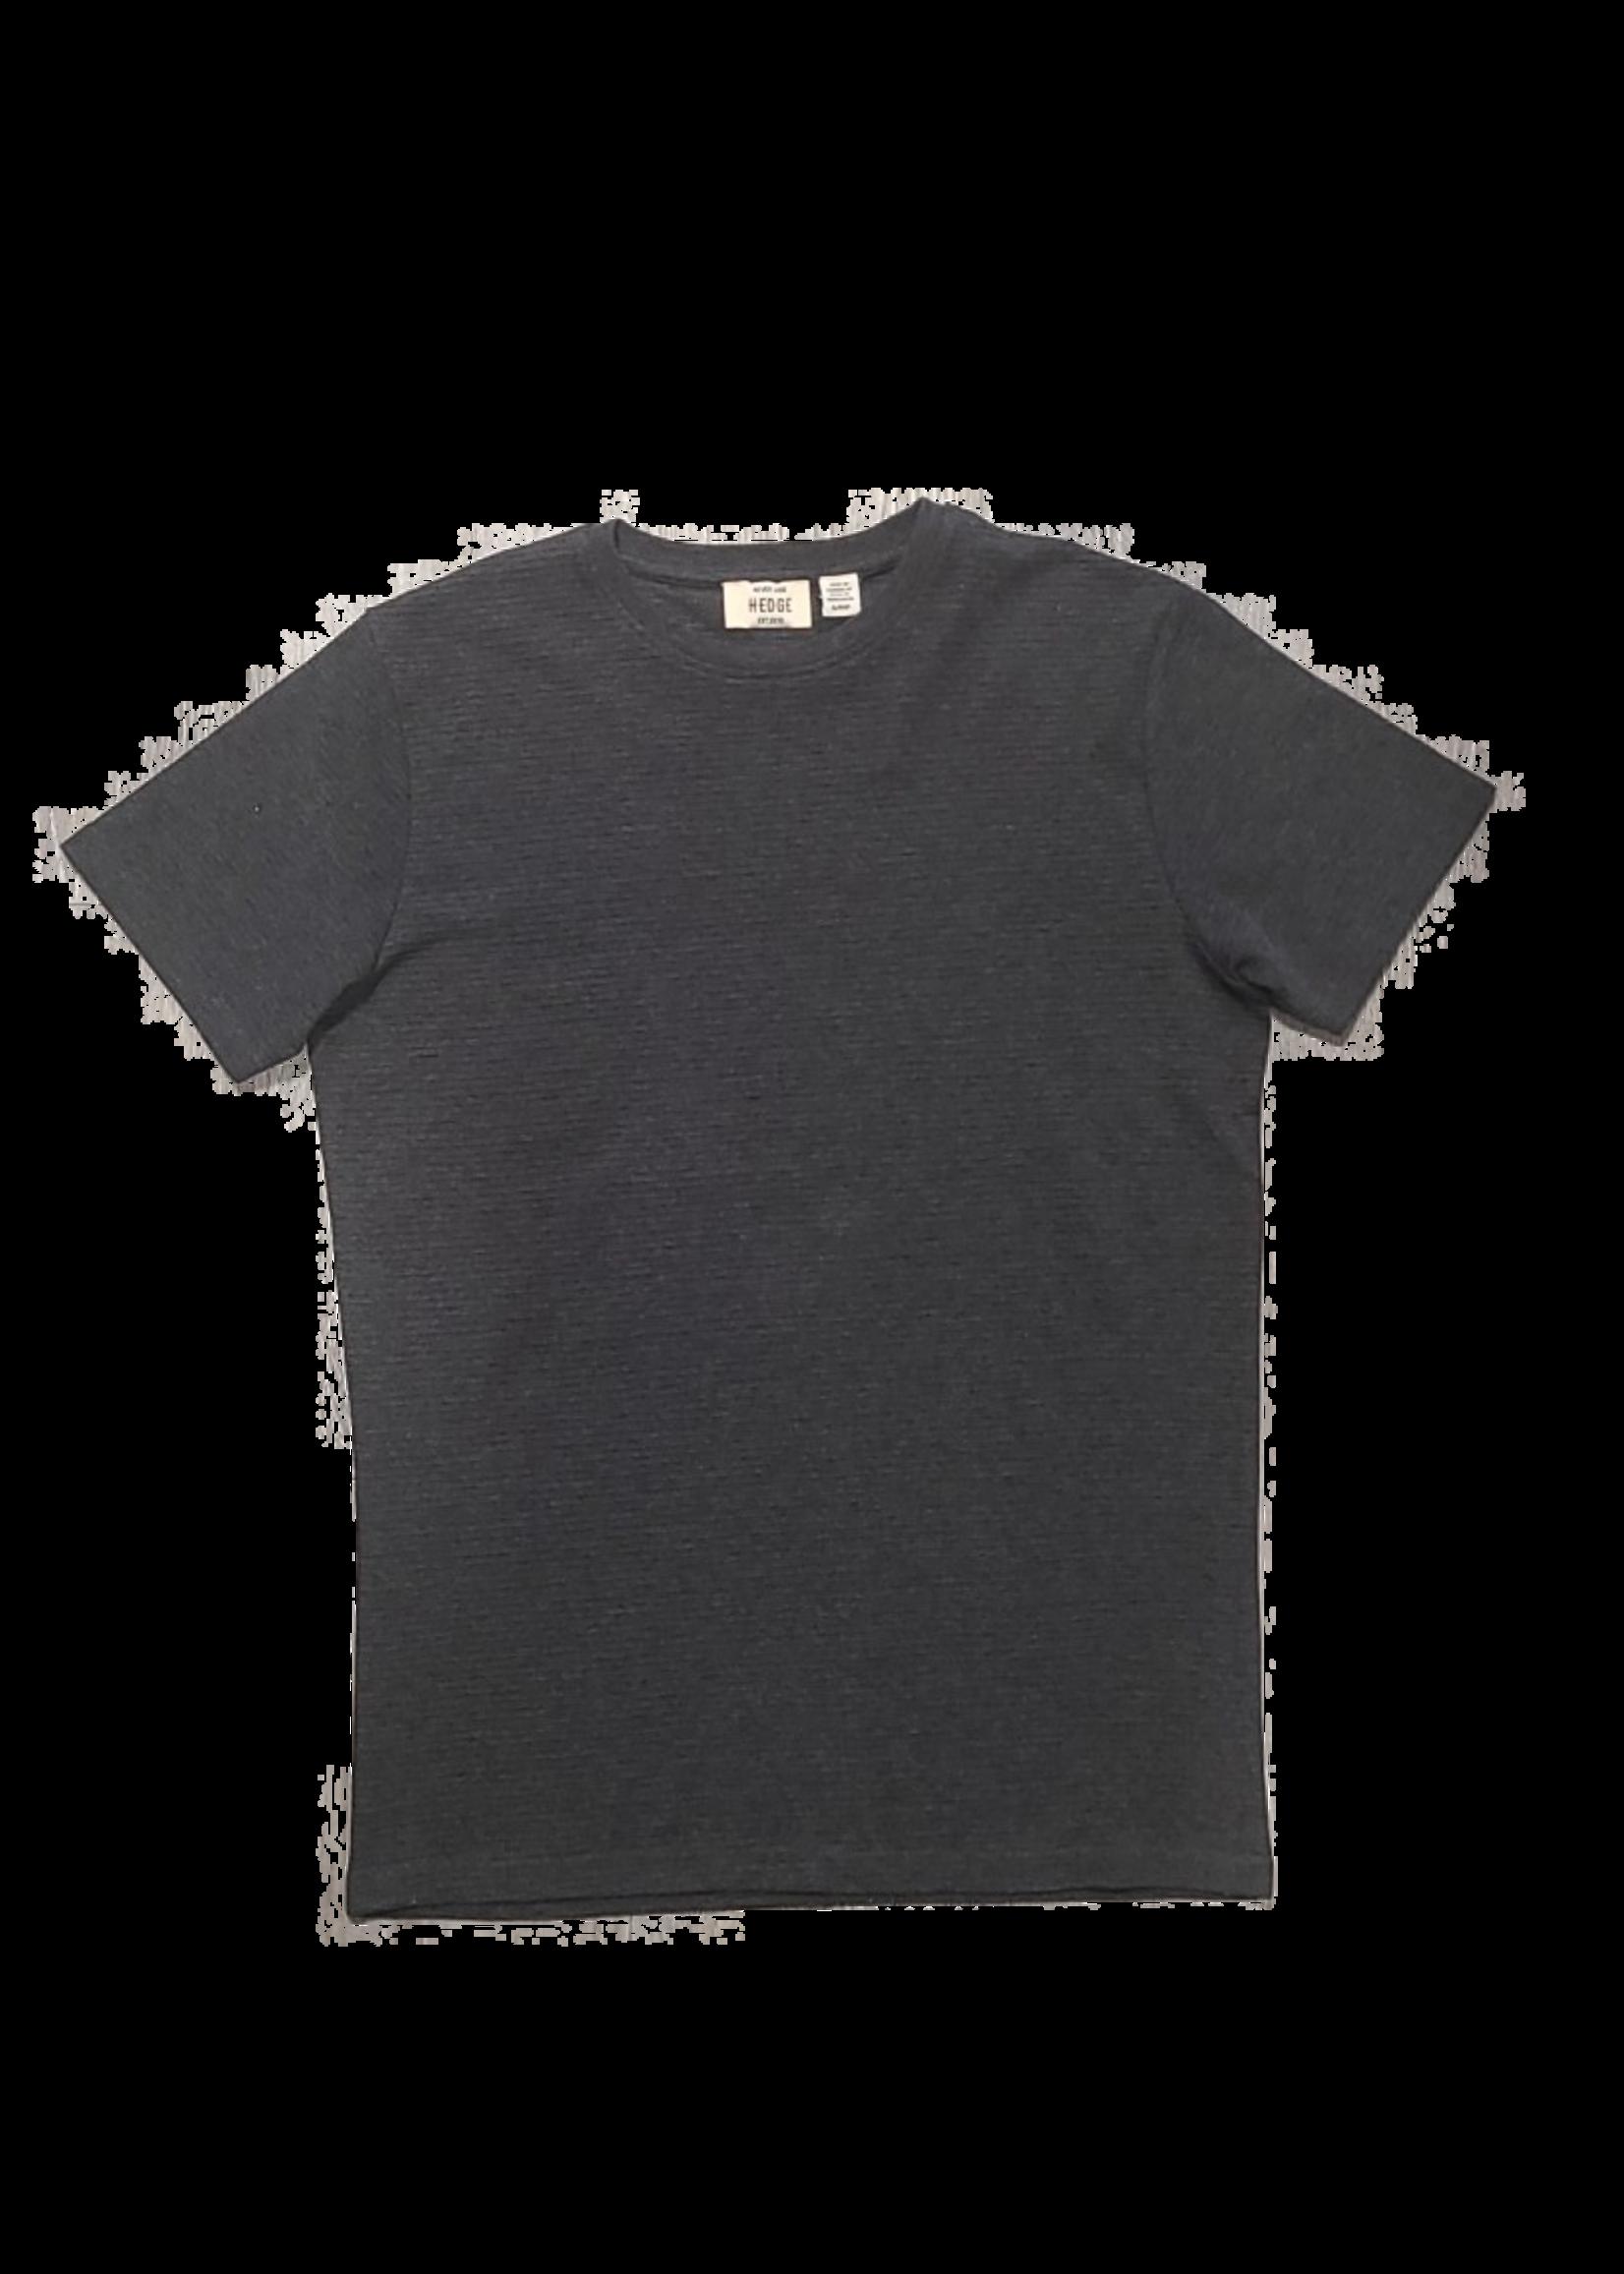 Hedge Hedge Knit T-Shirt 71MT197S1